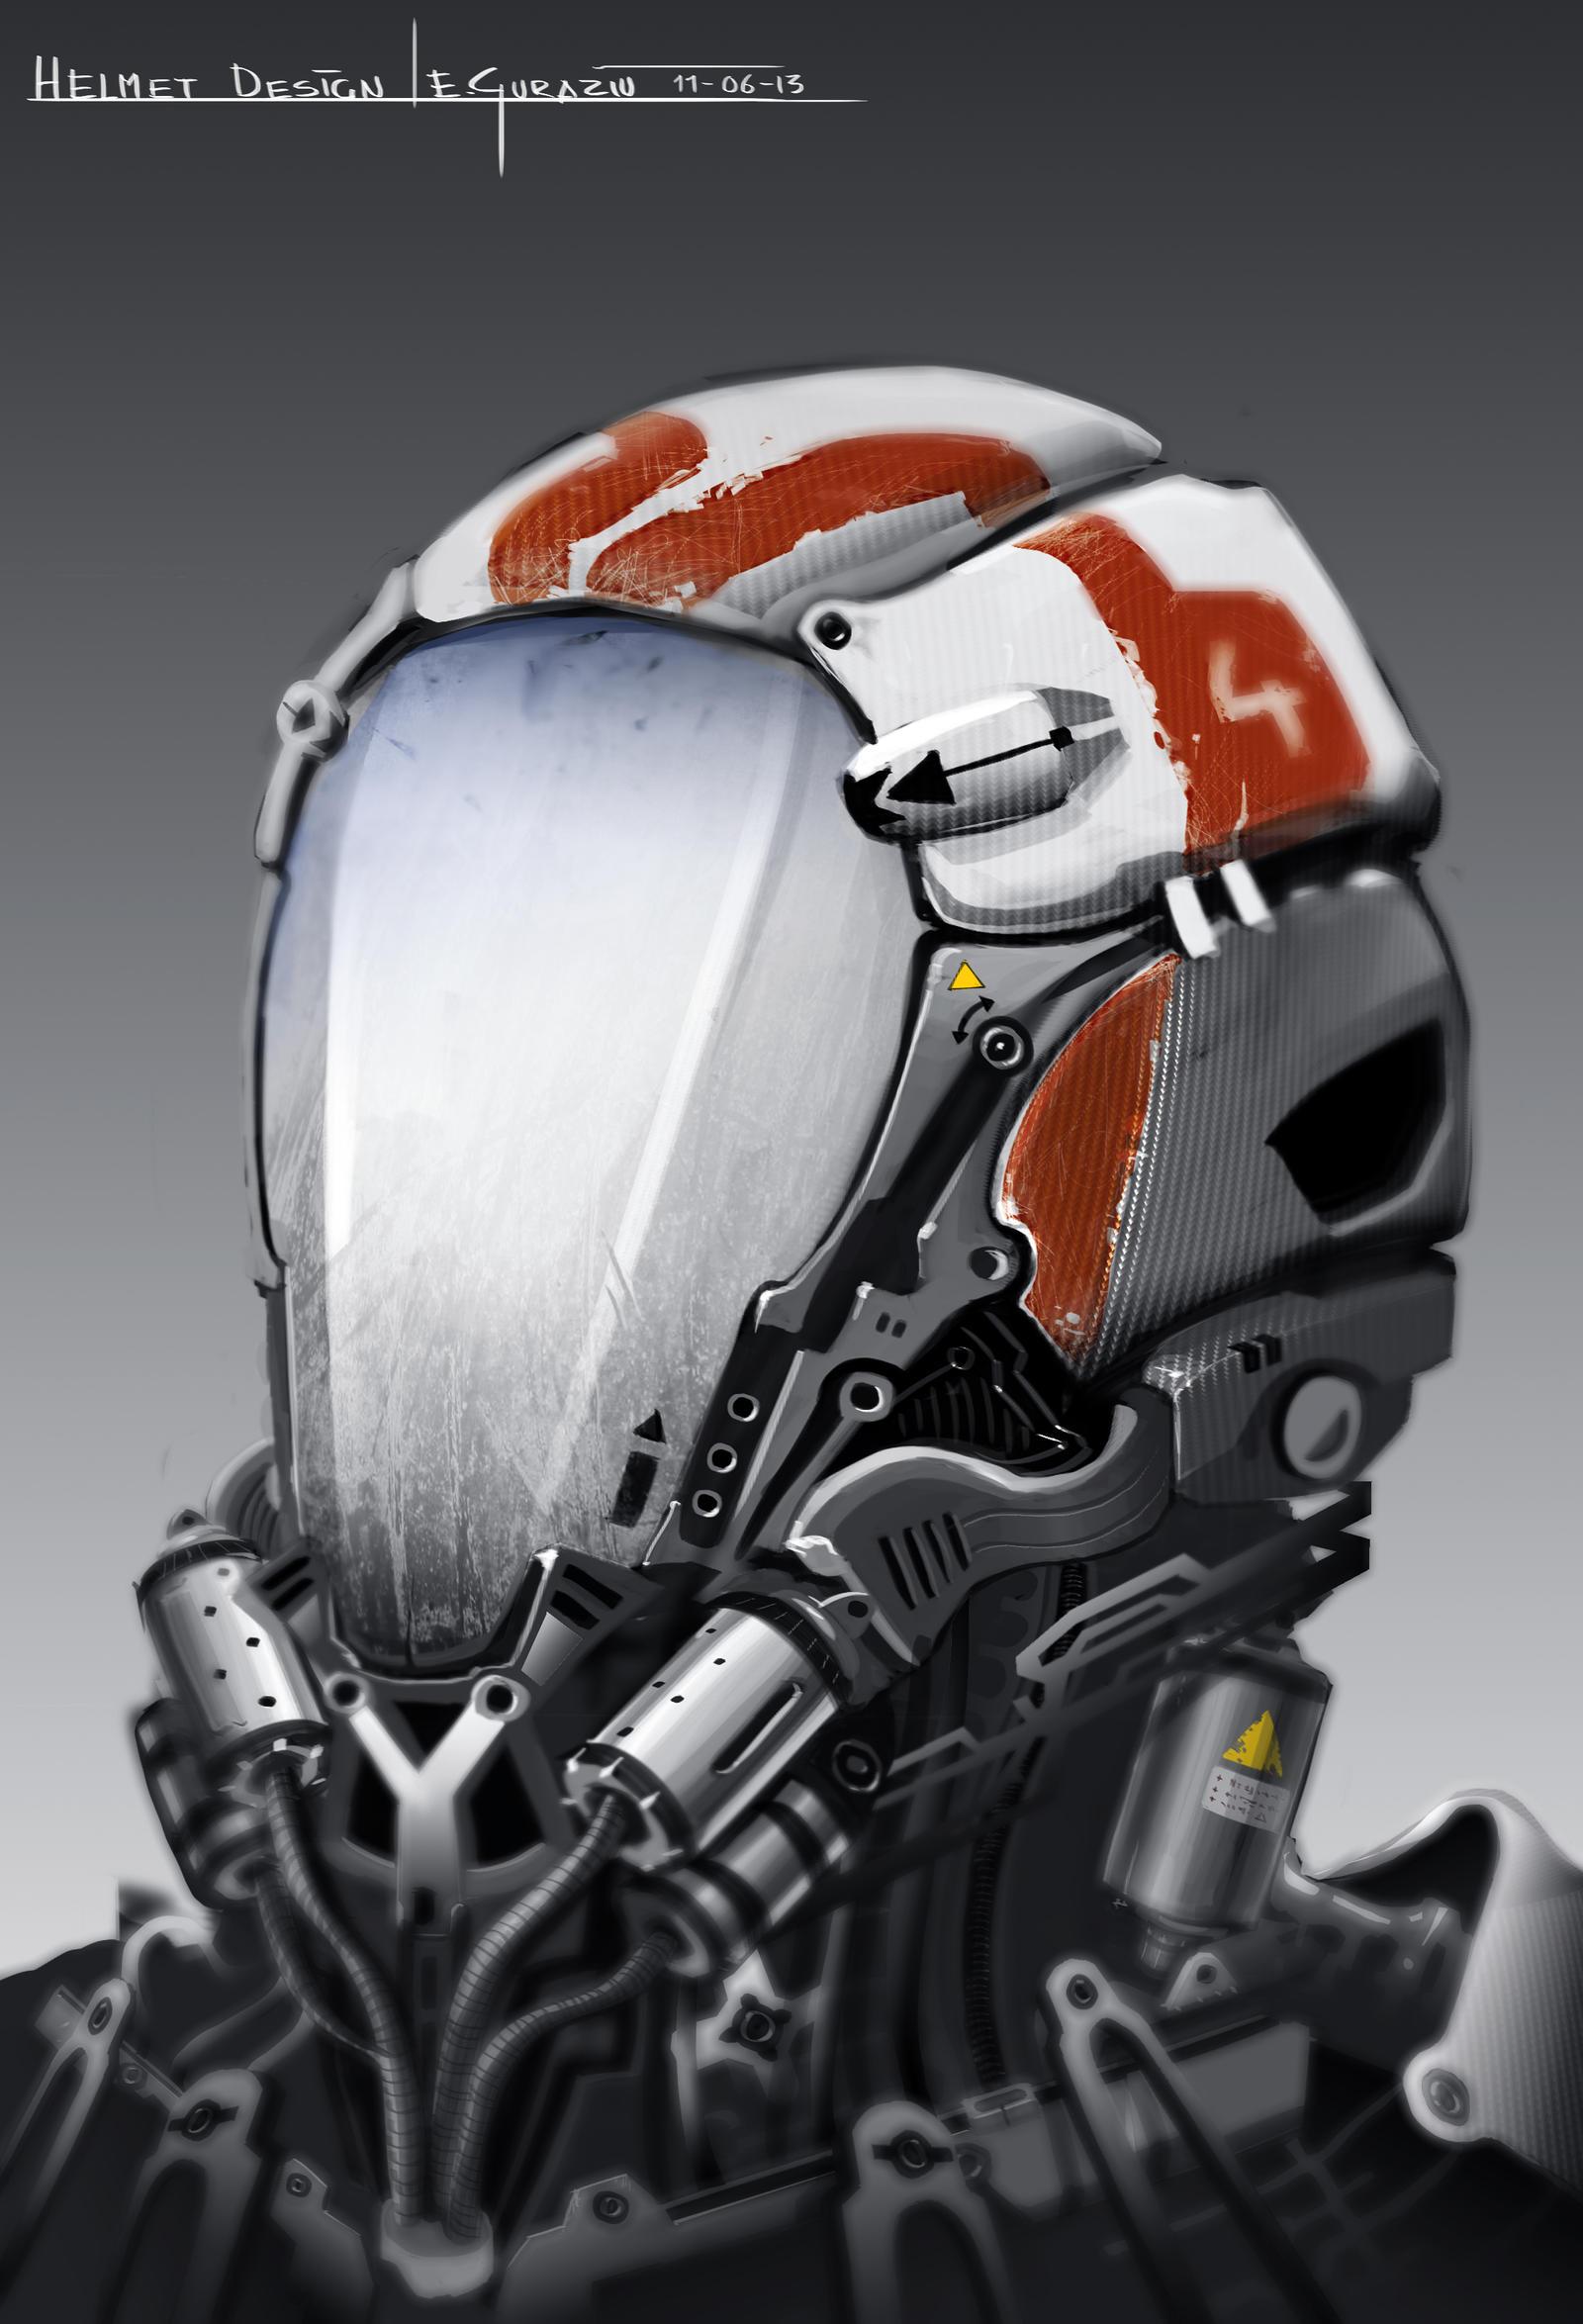 Helmet Design by DrZoidberg96